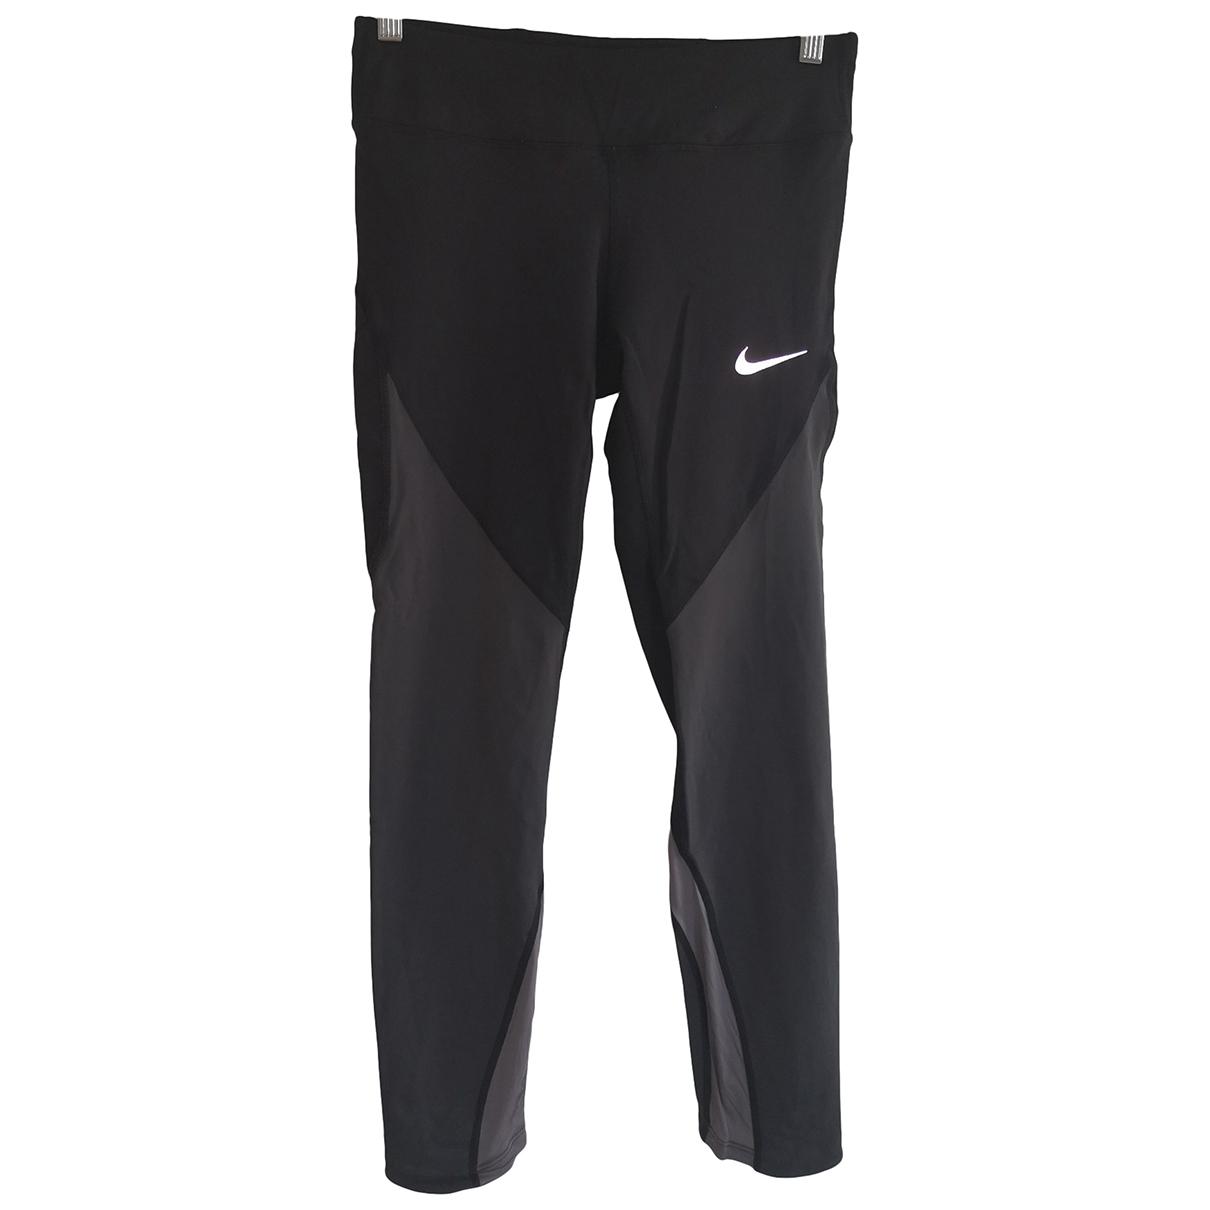 Nike \N Trousers for Women M